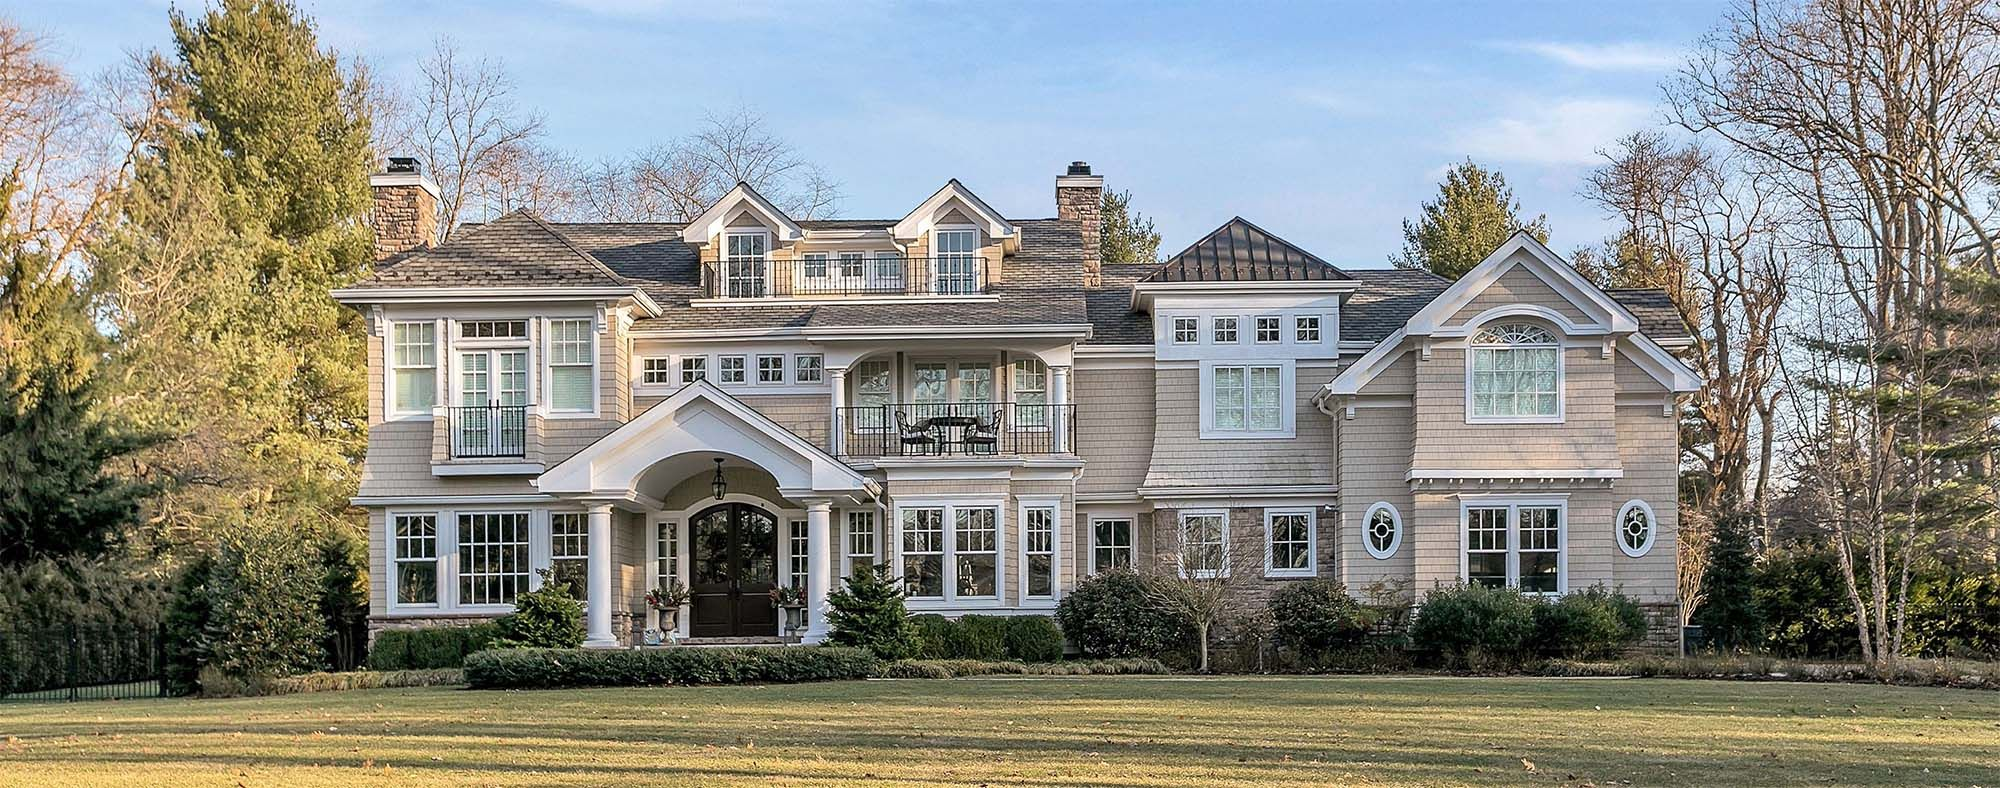 Large Custom Home With Tan Cedar Shake Siding And White Trim Stone Houses Shingling New Home Builders